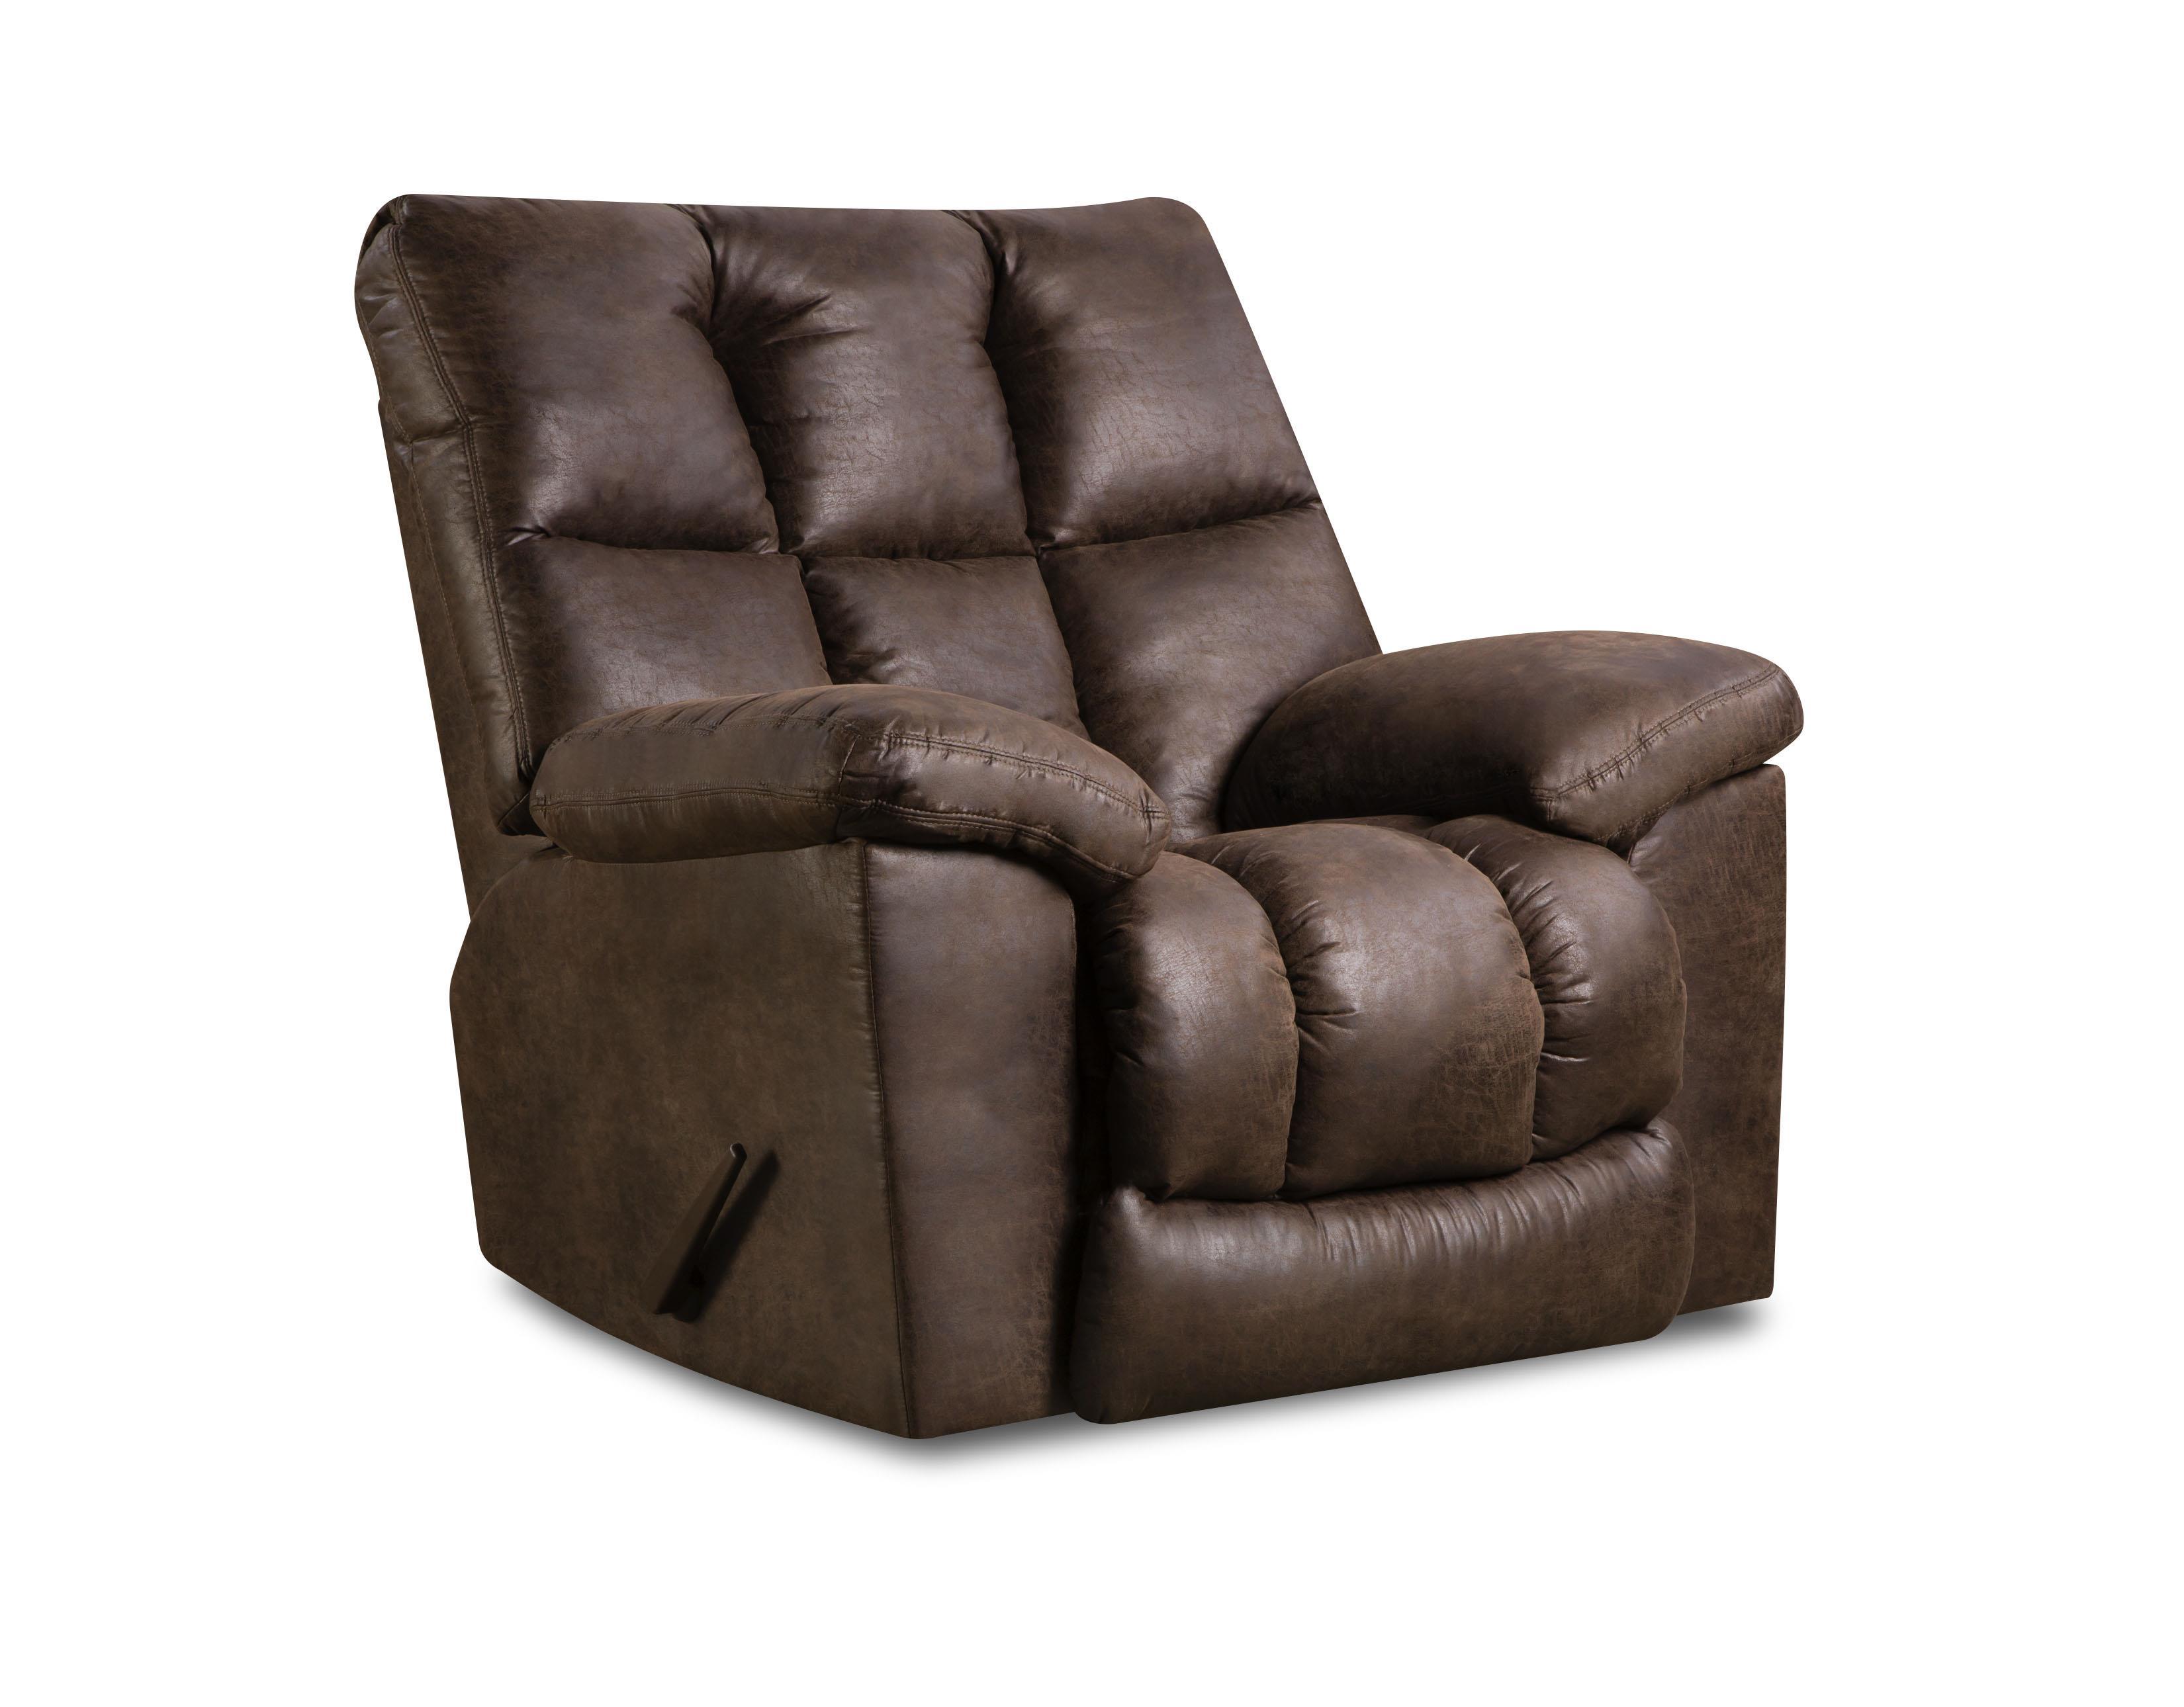 United Furniture Industries U694 Rocker Recliner - Item Number: U694-LattimerCocoa